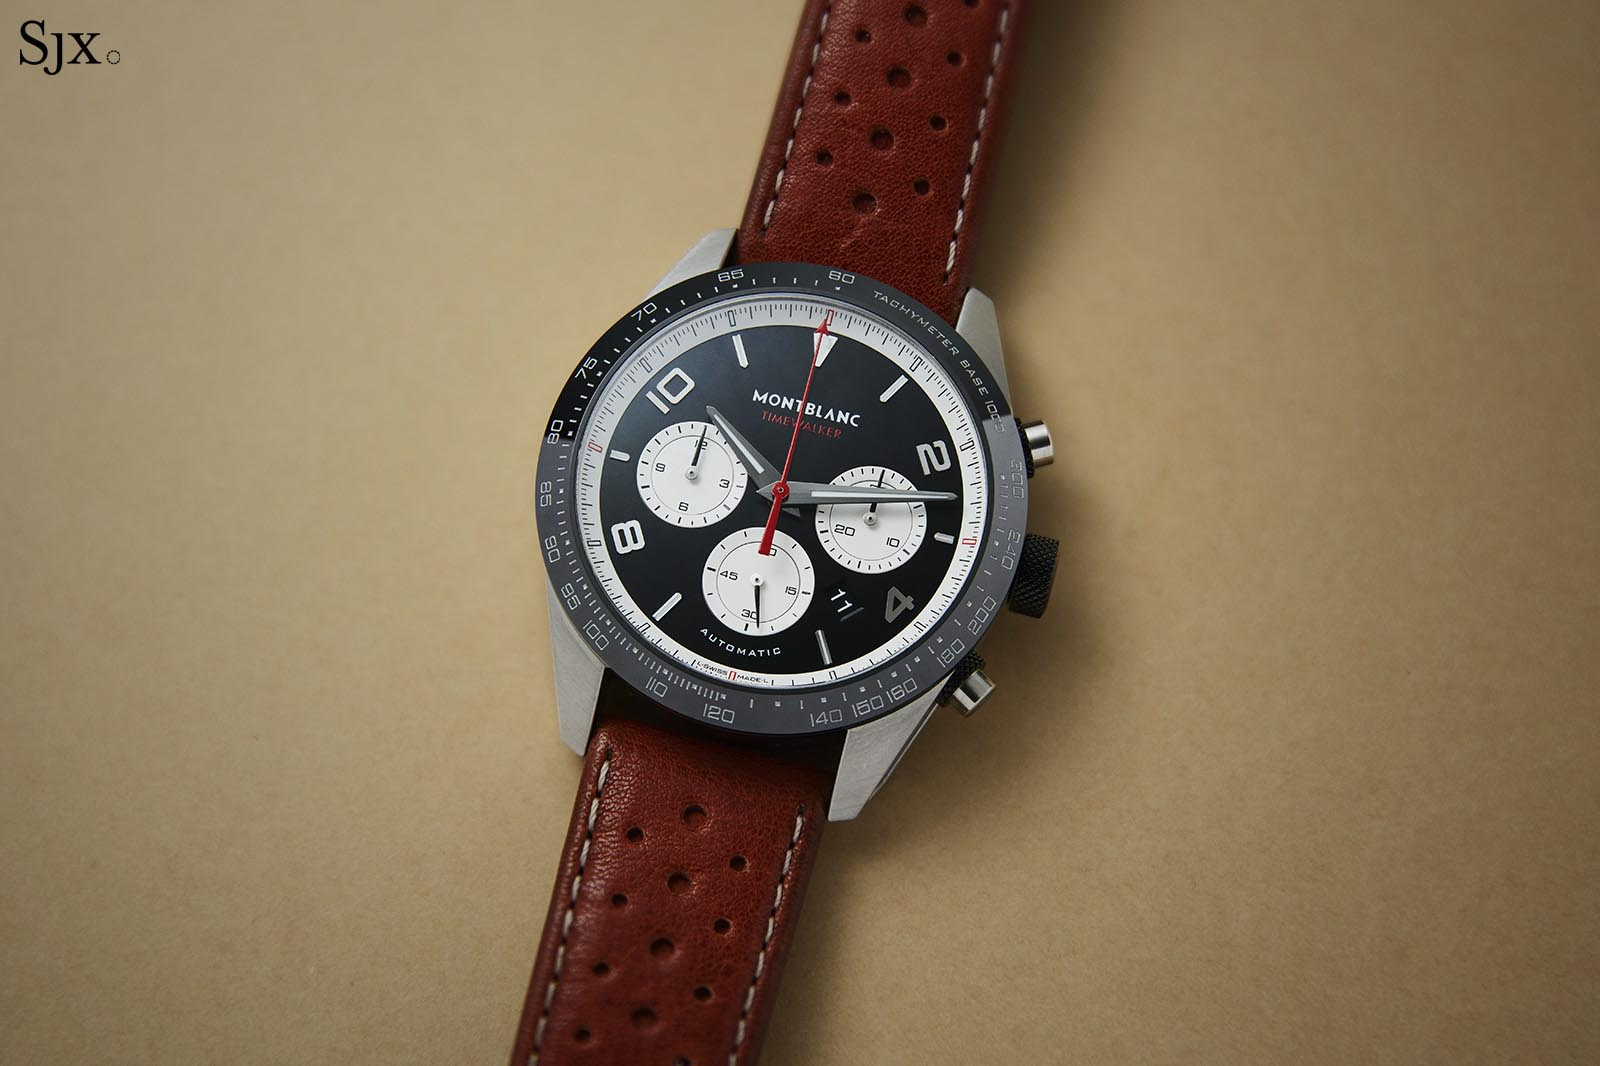 Monblanc Reverse Panda TimeWalker Manufacture Chronograph